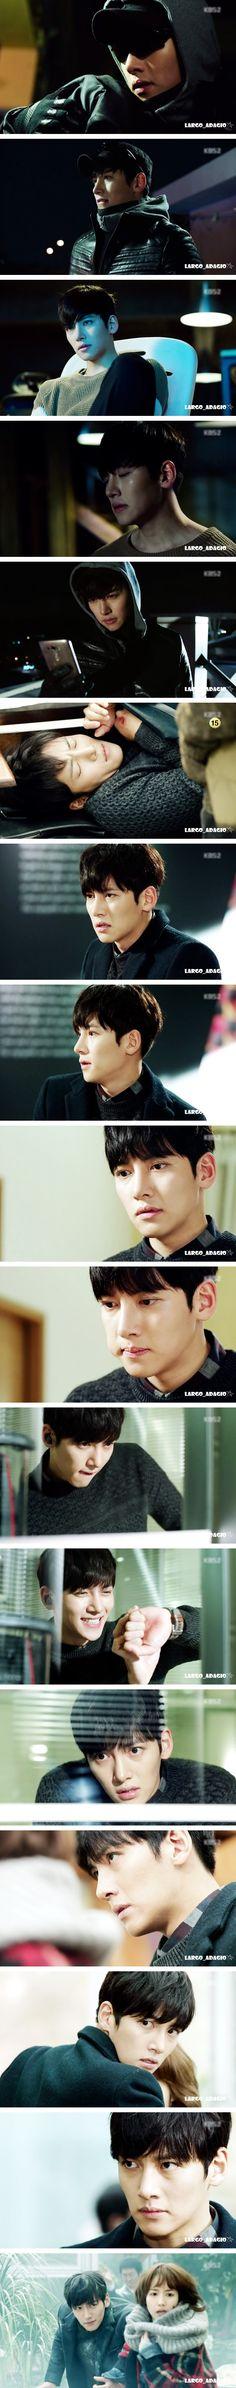 Healer (힐러) Korean - Drama - Episode 5 - Picture @ HanCinema :: The Korean Movie and Drama Database